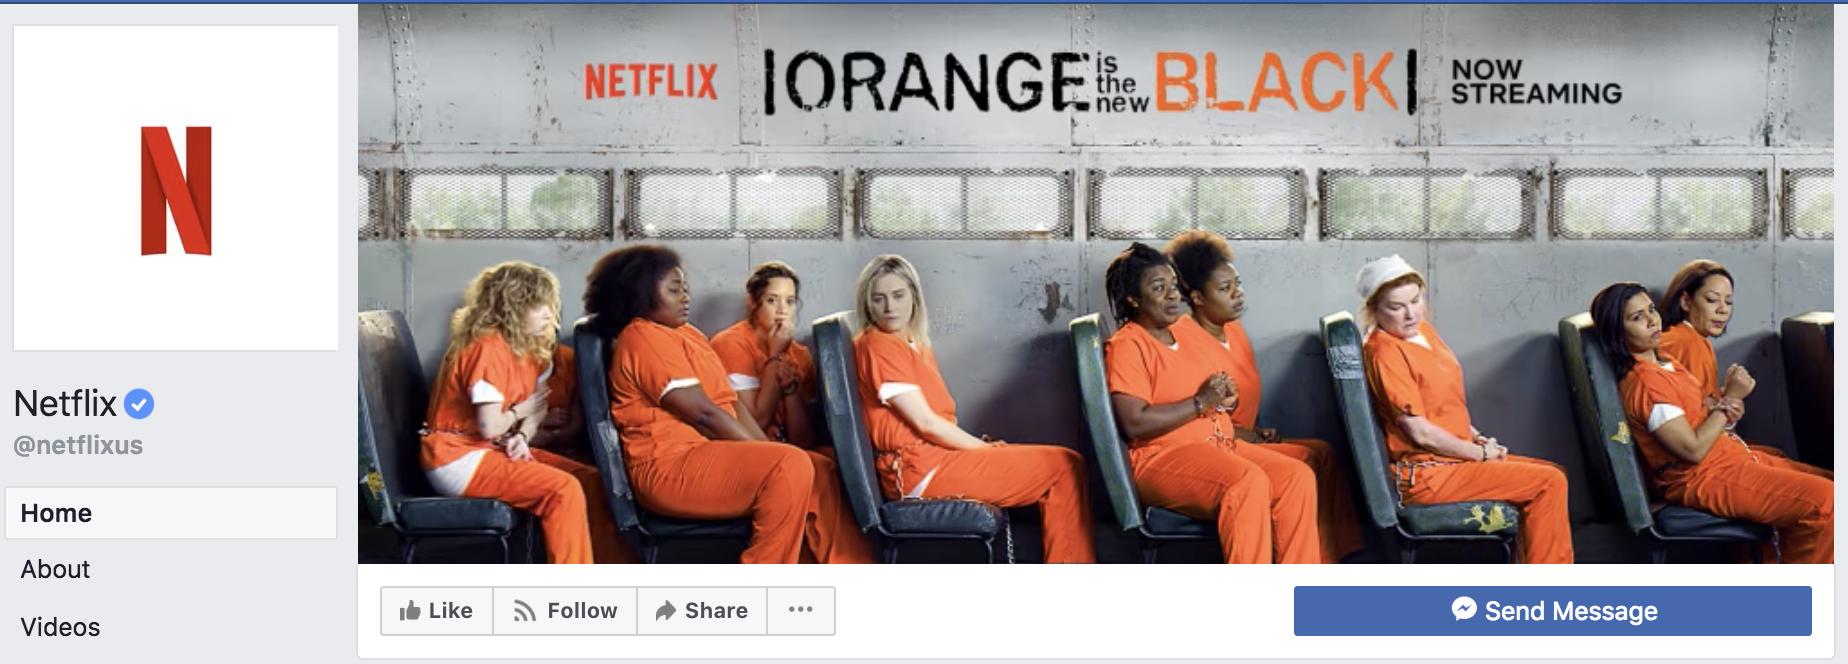 Netflix_Facebook cover photo